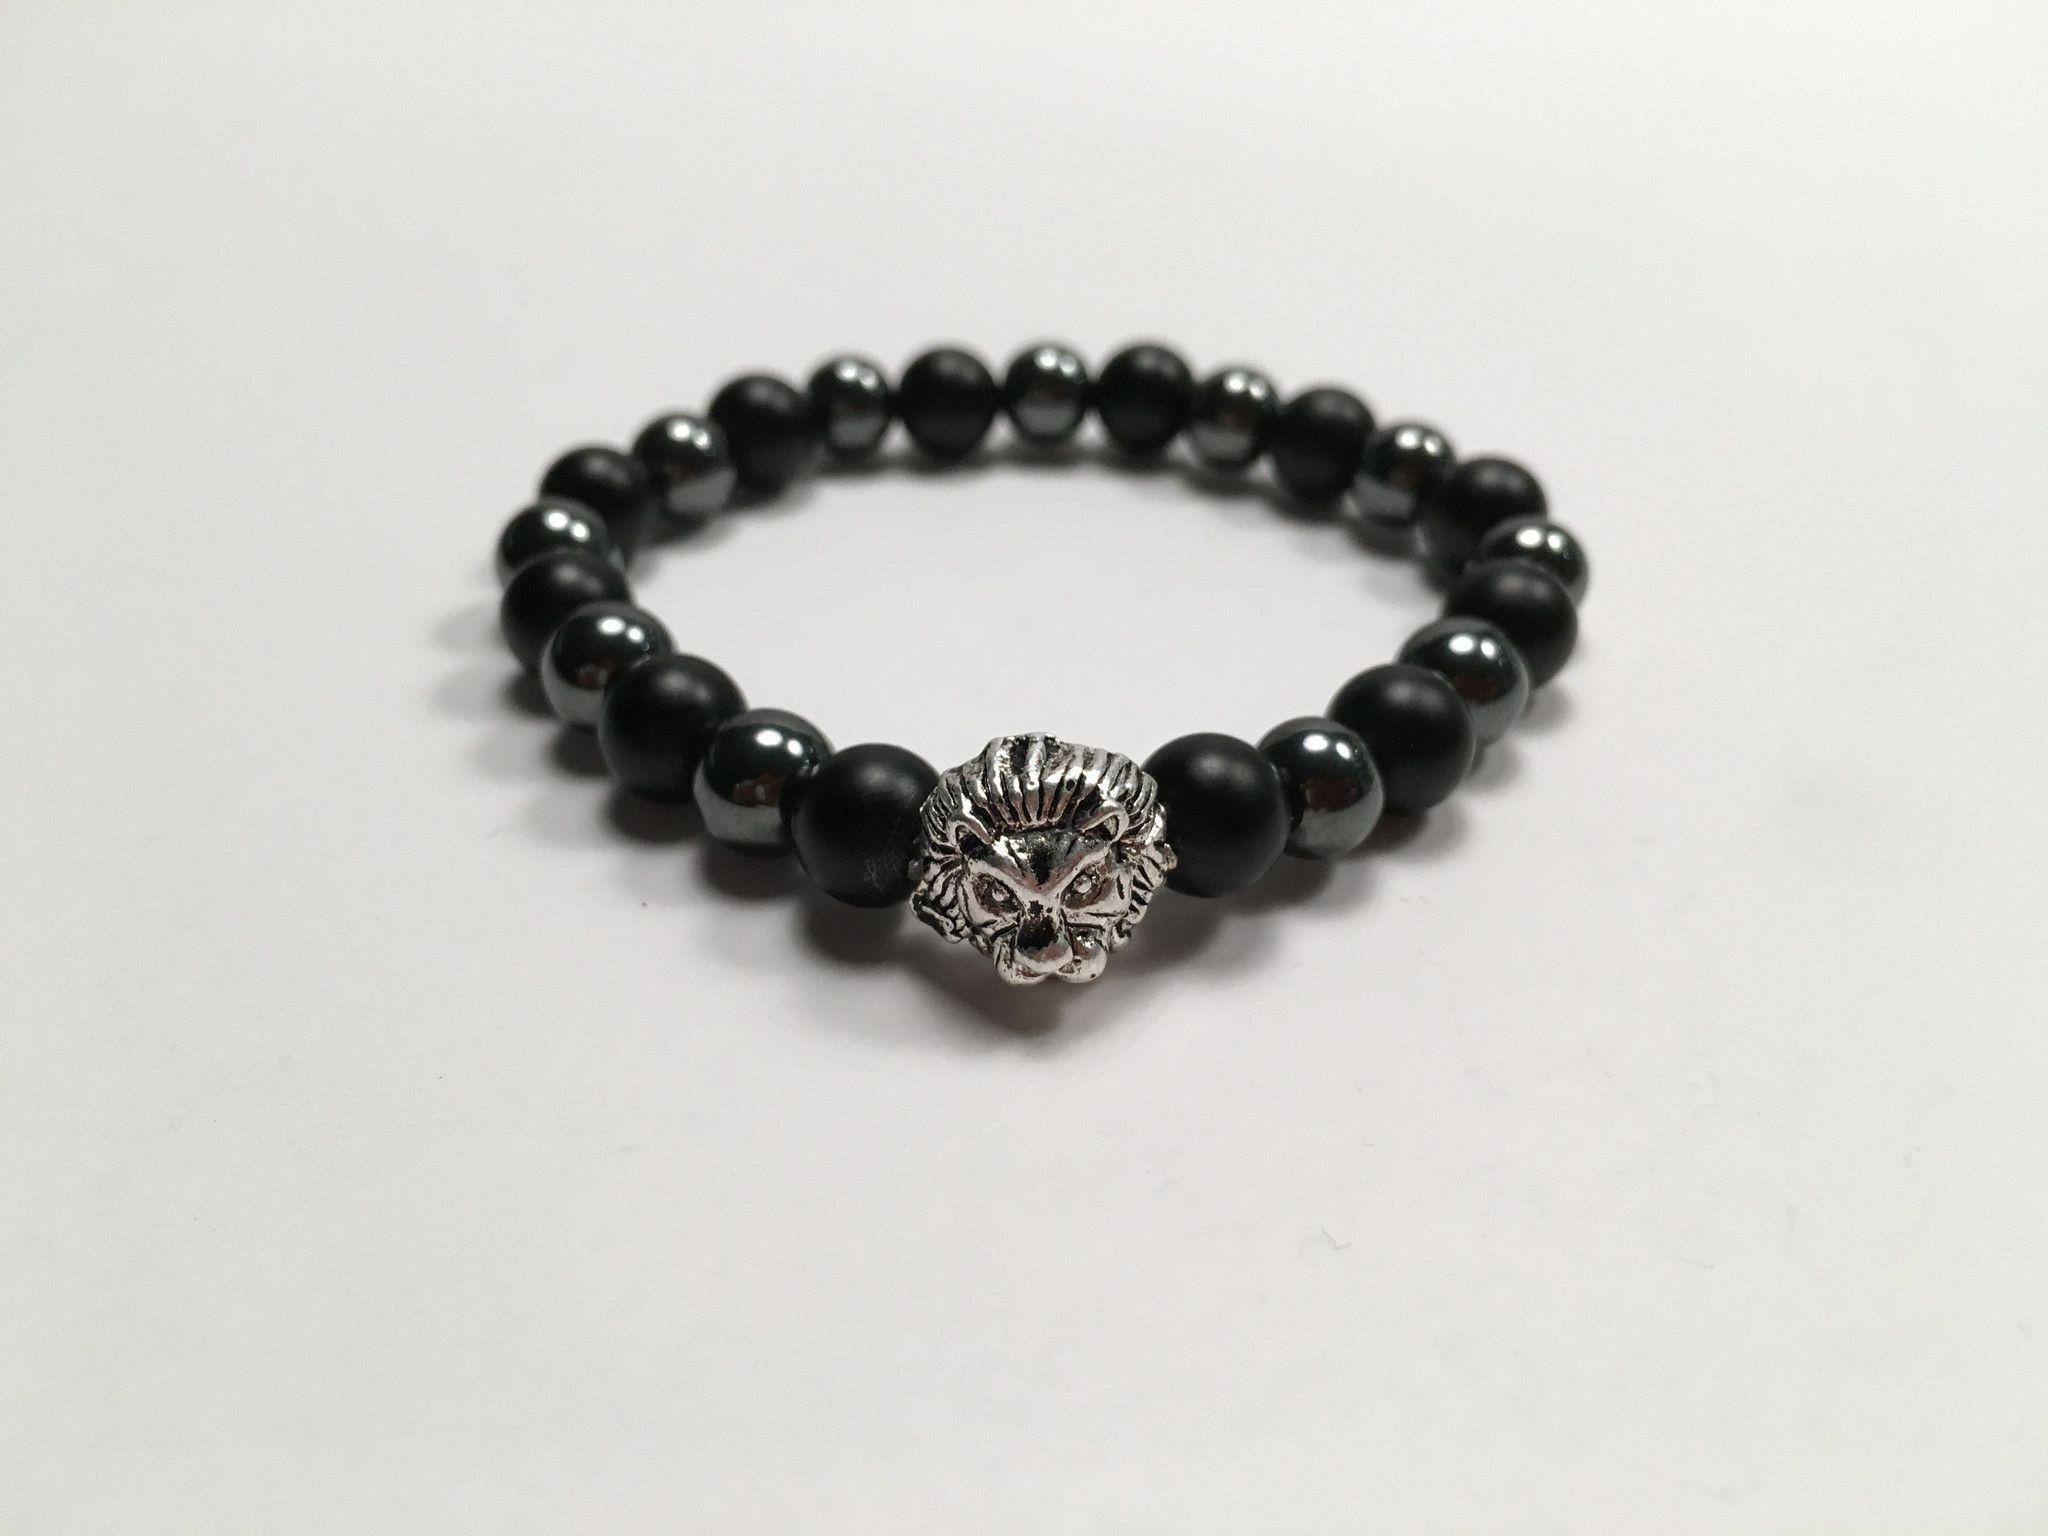 Buddha Bracelet, Black Dull Polish Matte Onyx & Black Hematite Beads, Lion head, Beads bracelet